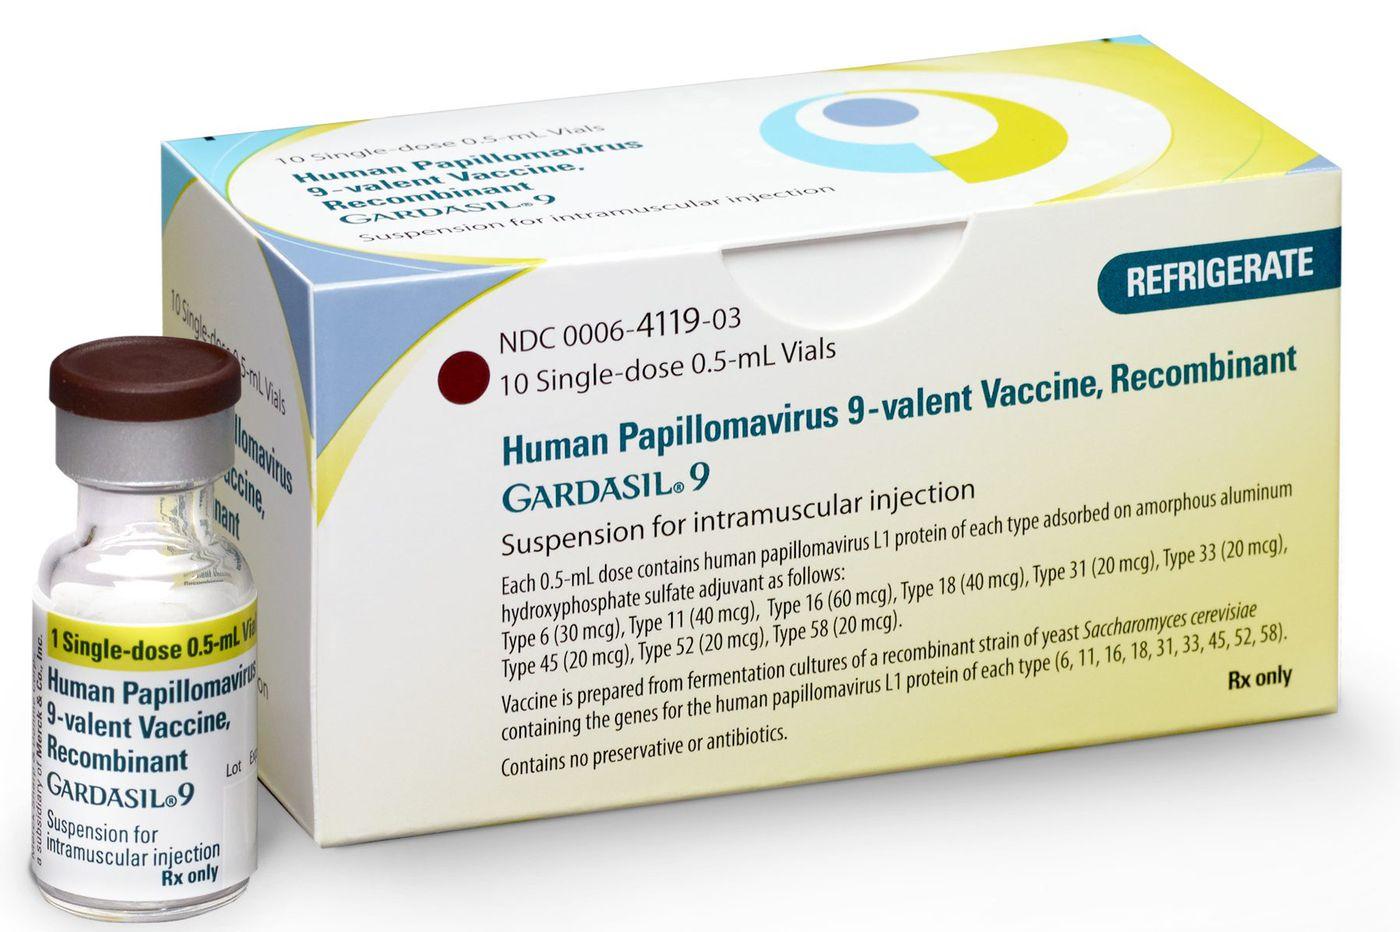 hpv gardasil prevents cancer